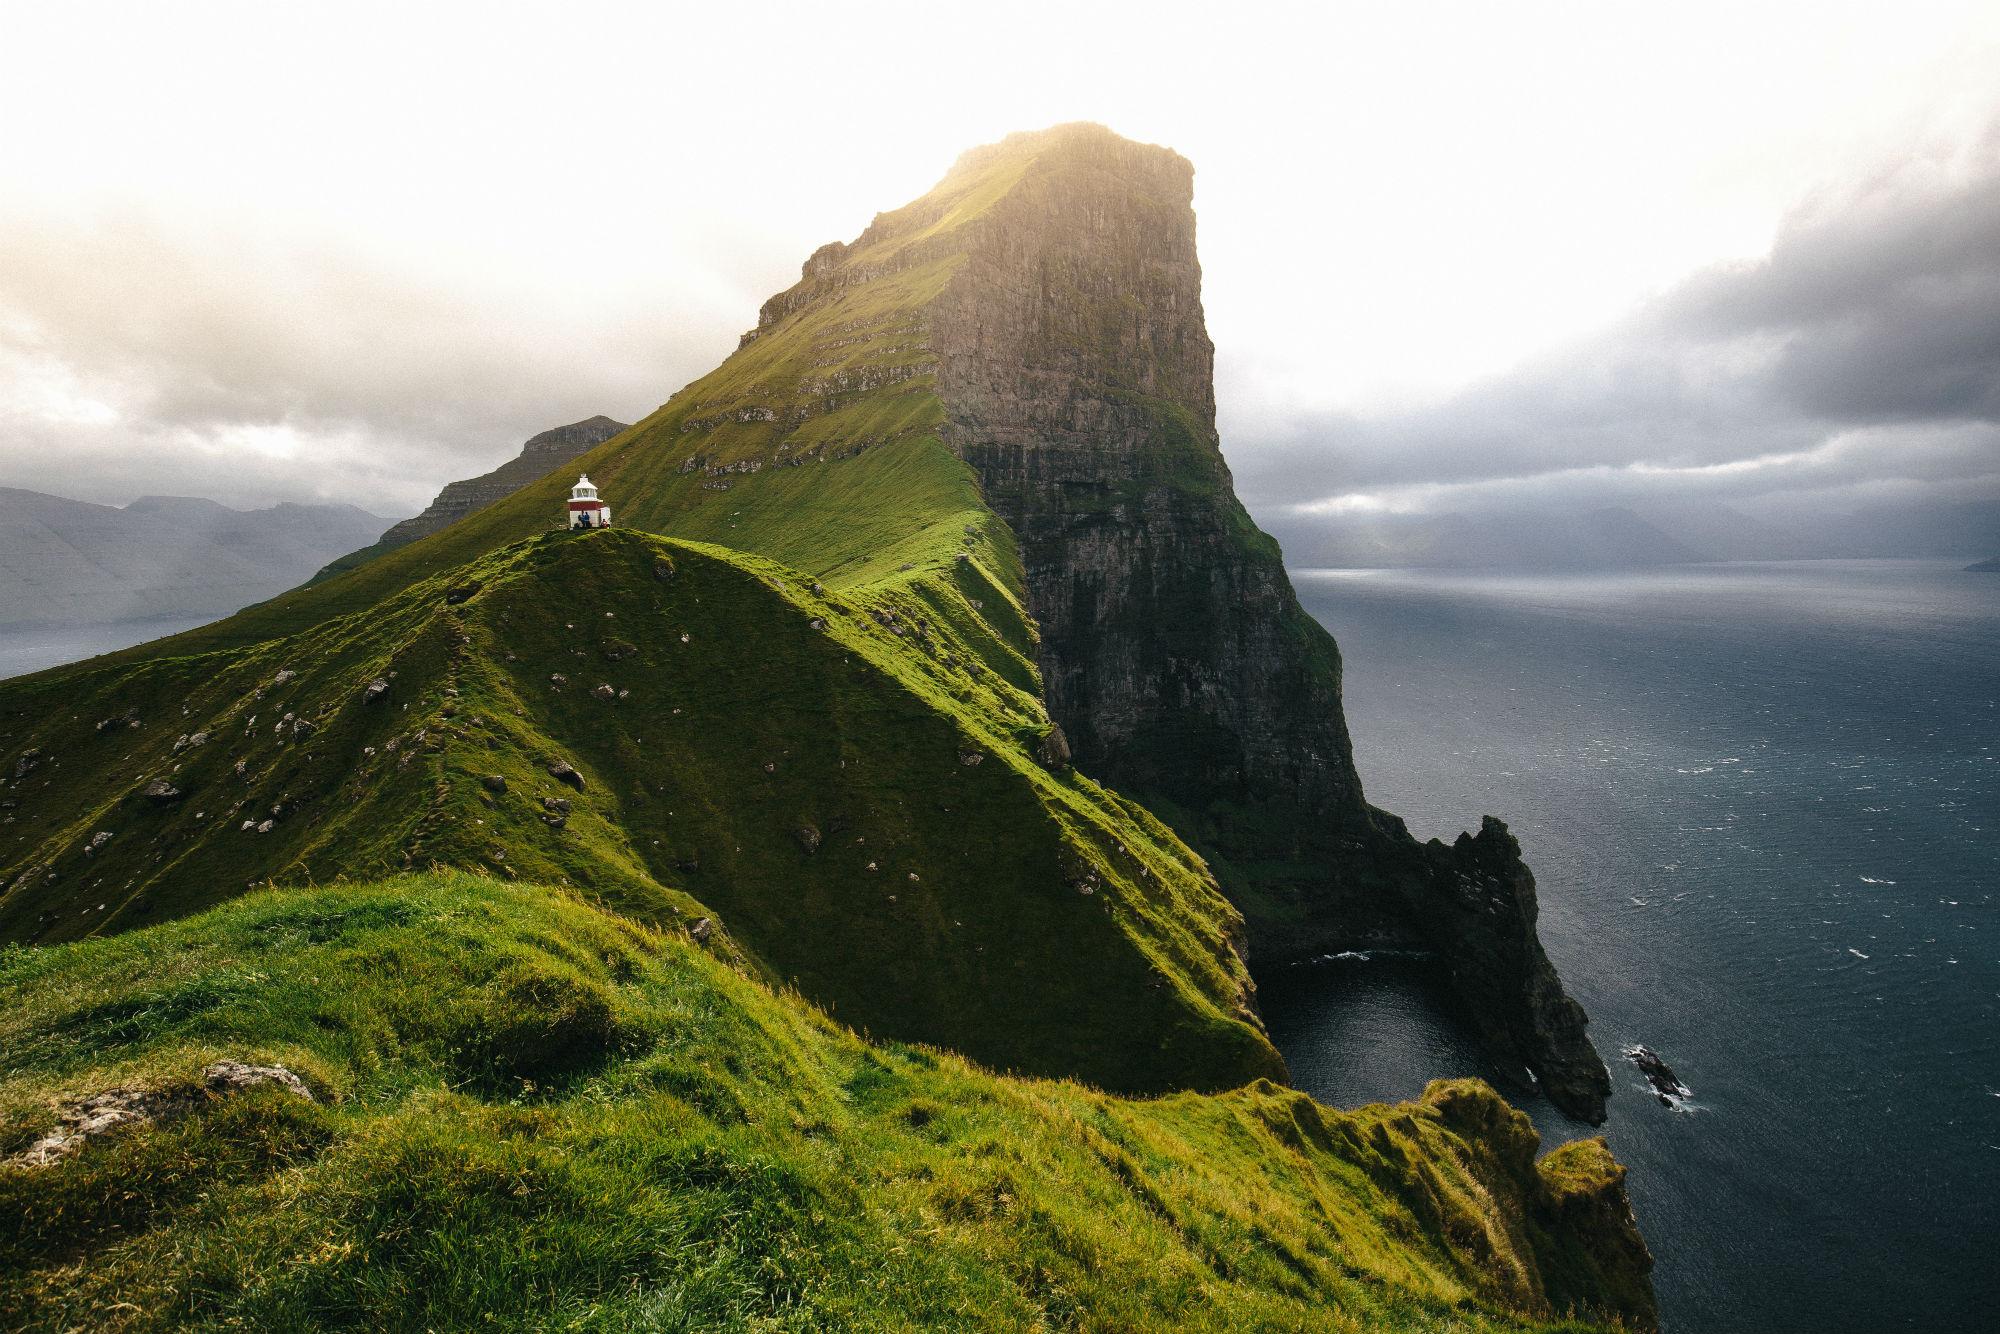 landscape photography tricks image